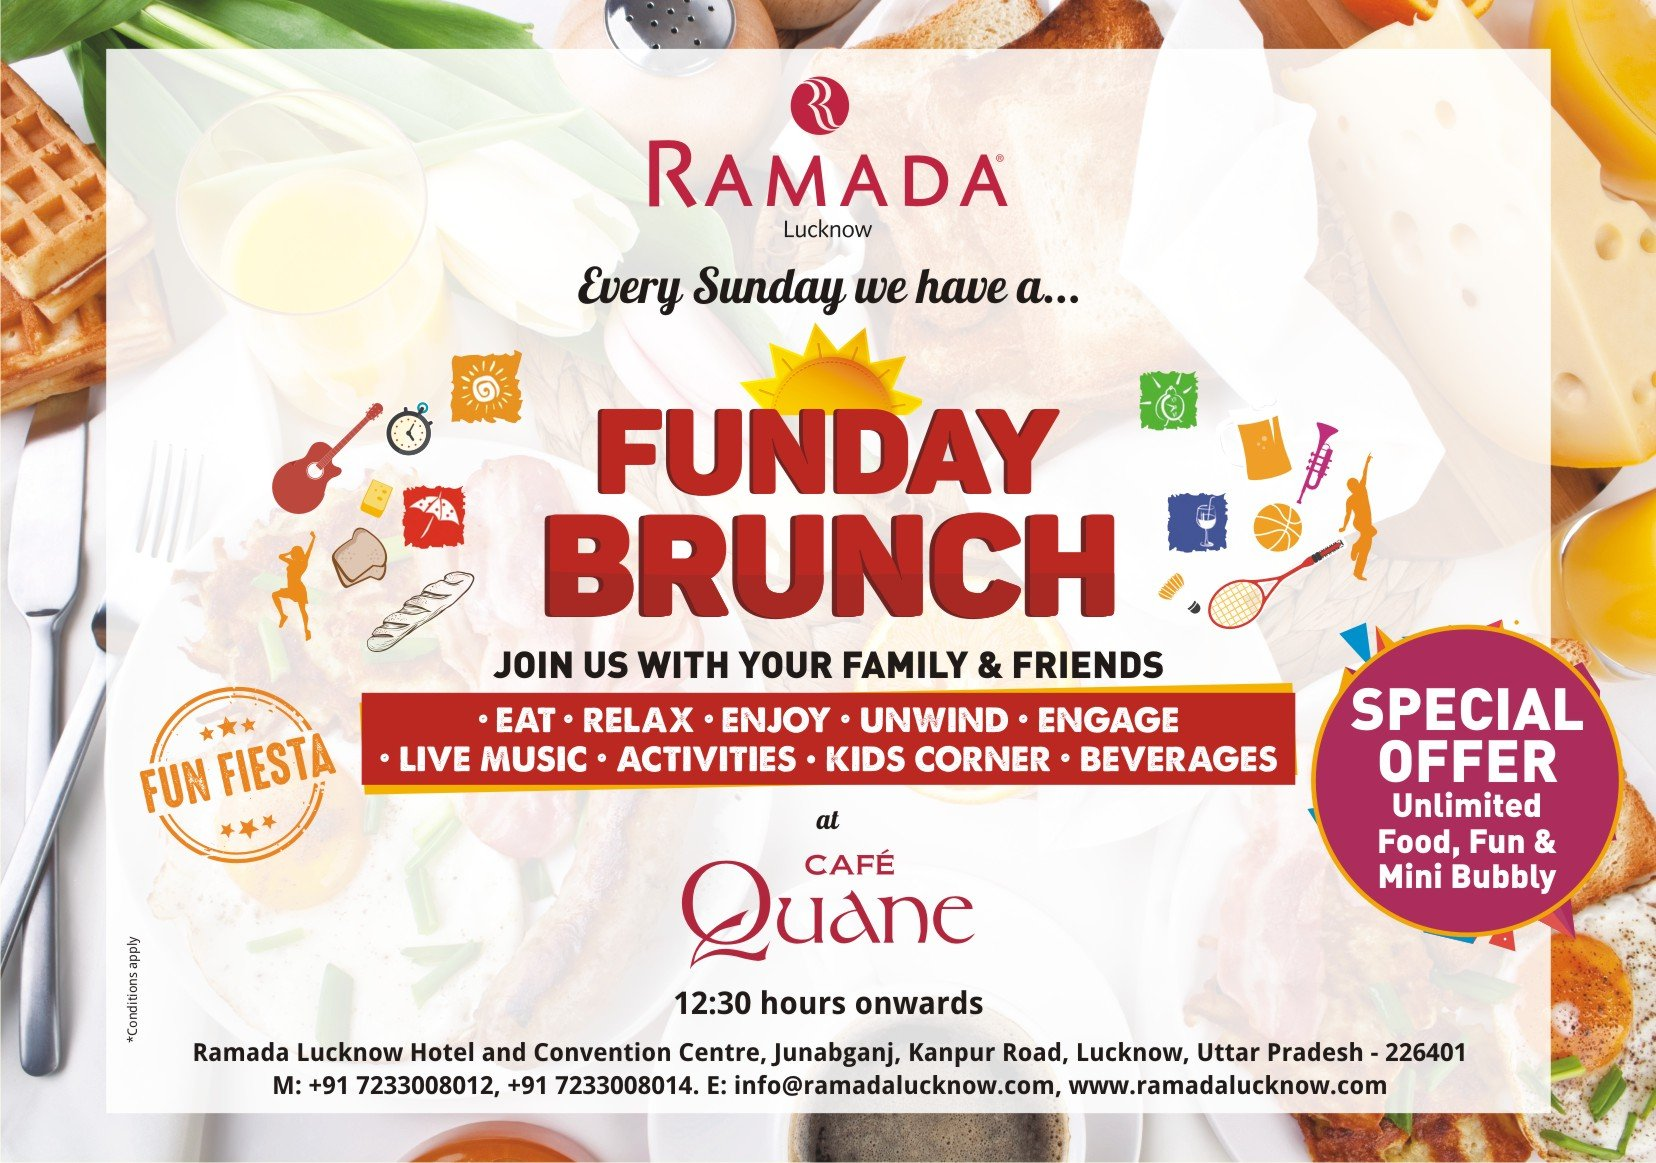 Ramada Lucknow Sunday Brunch Funday Brunch